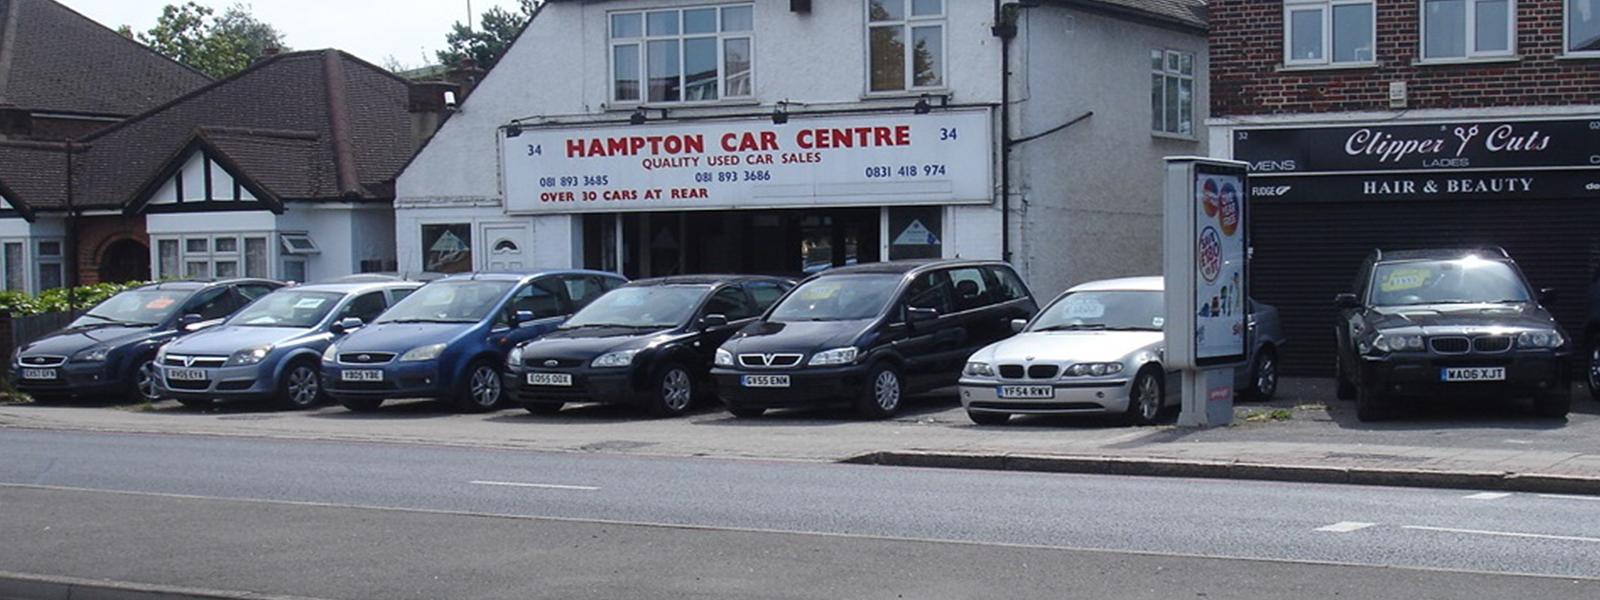 Hampton Car Centre